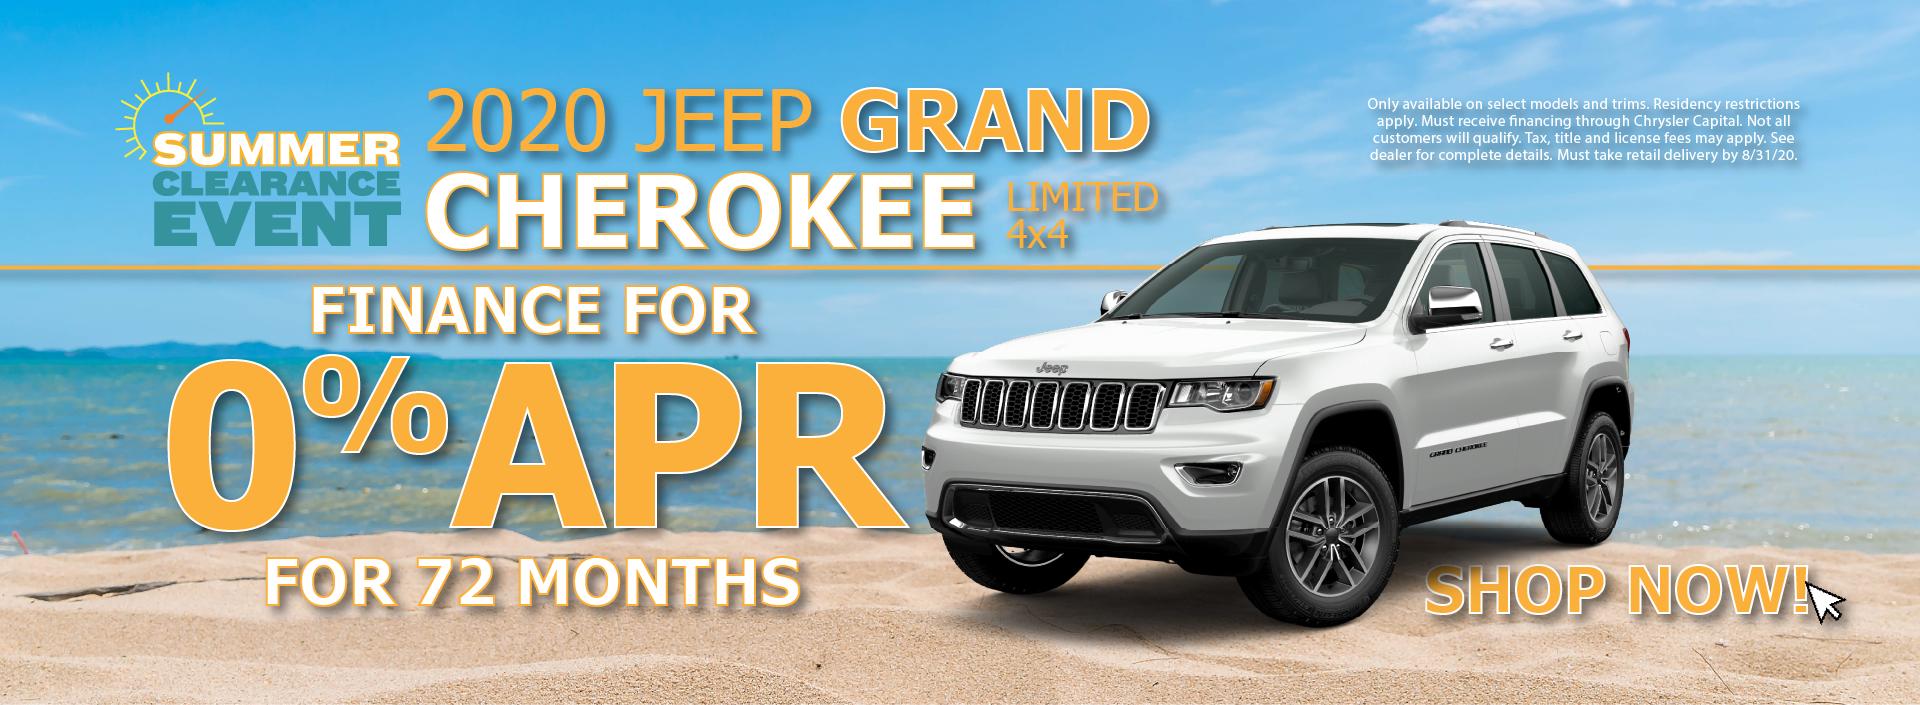 2020 Jeep Grand Cherokee 0% APR